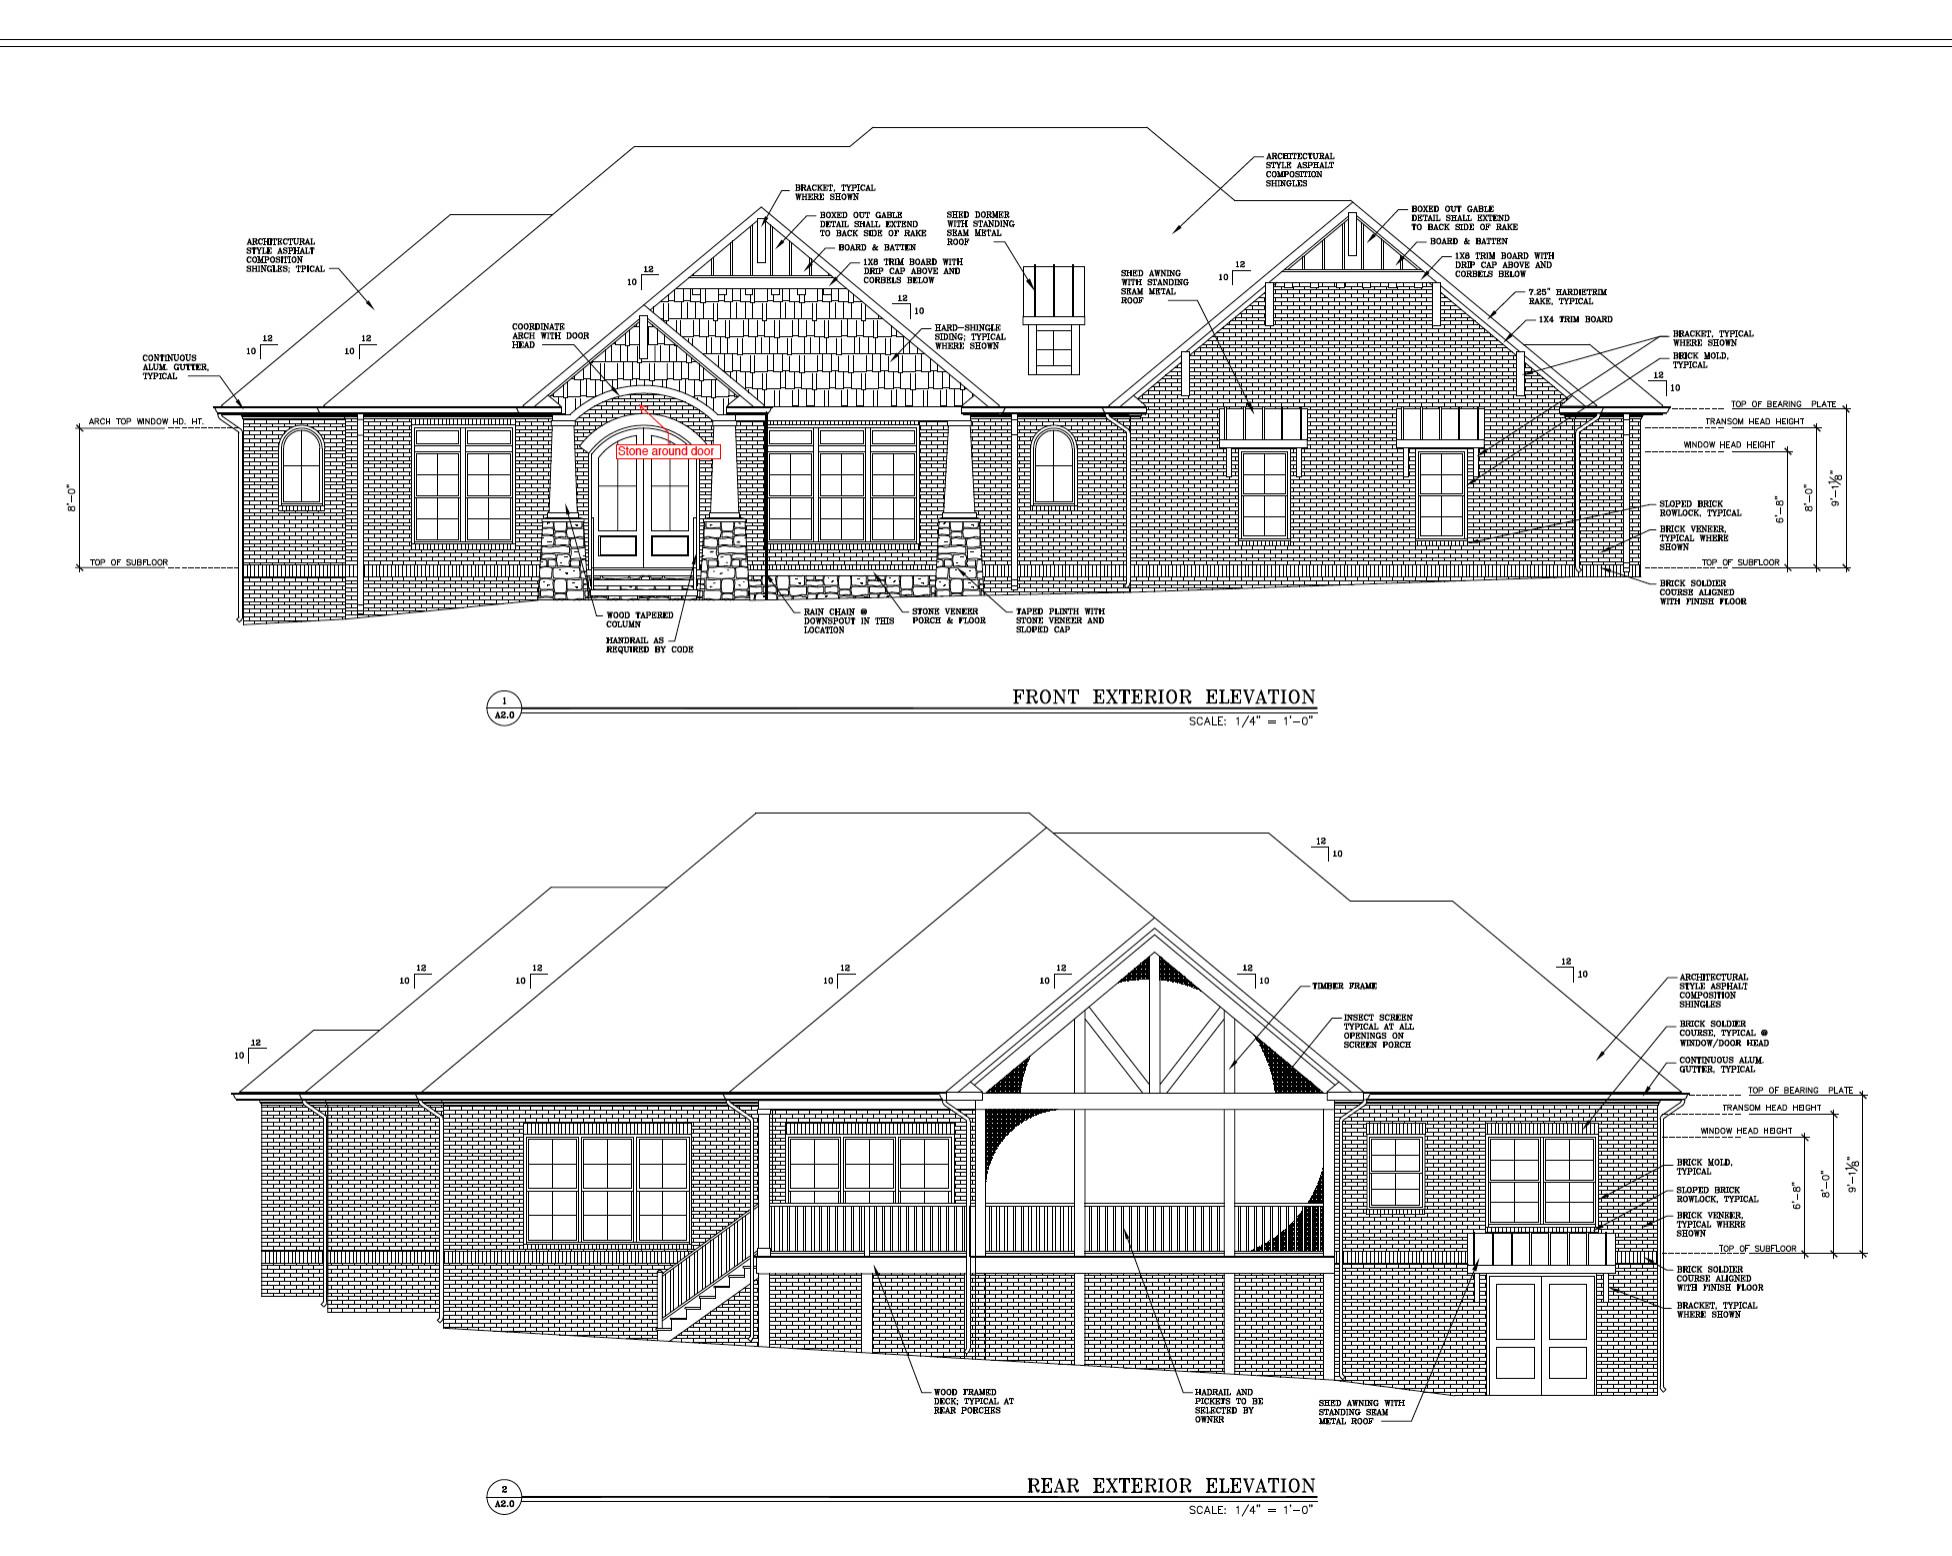 For Sale in Powdersville 3800 sq.ft., $750k